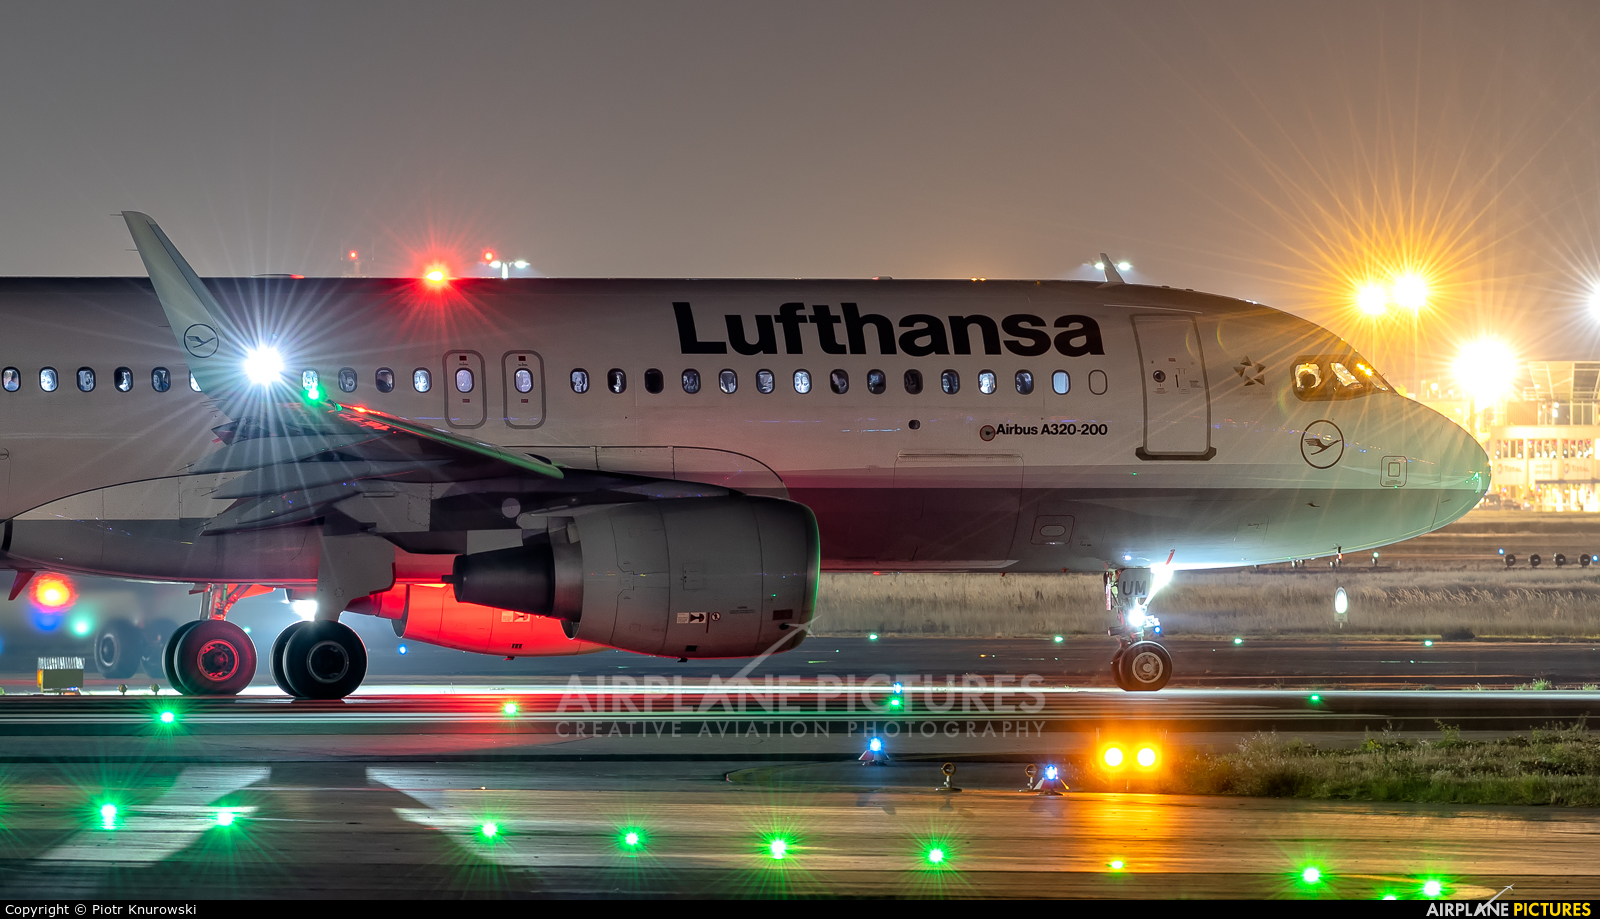 Lufthansa D-AIUM aircraft at Frankfurt